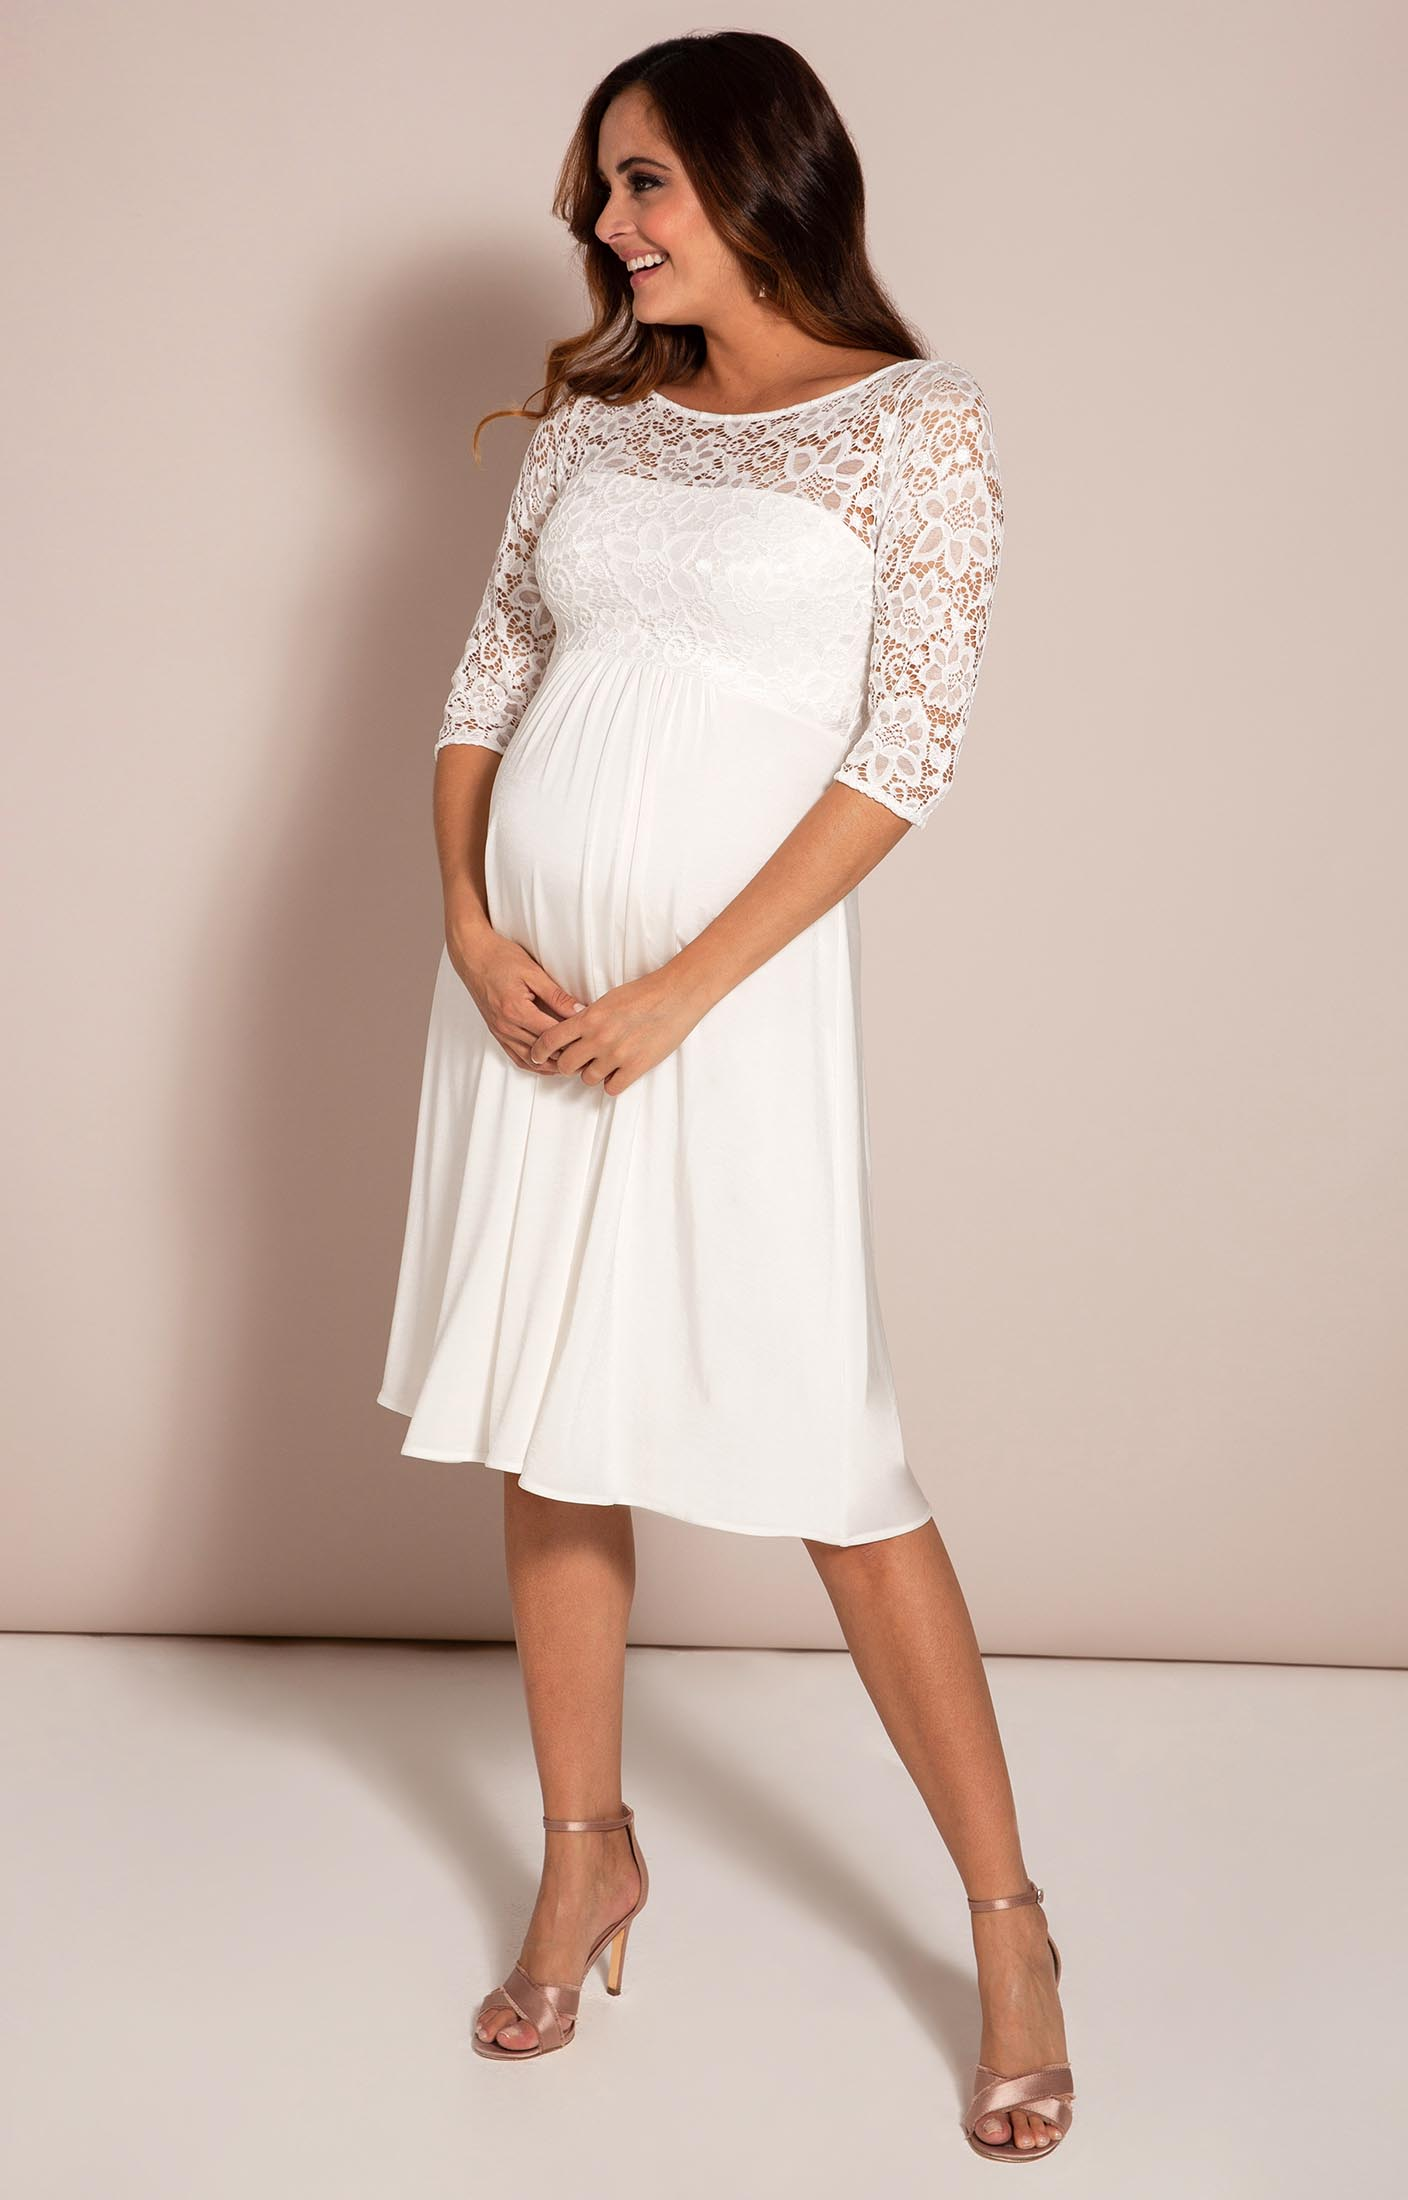 fbc7c9db17 Lucia Maternity Wedding Dress Short Ivory - Maternity Wedding Dresses